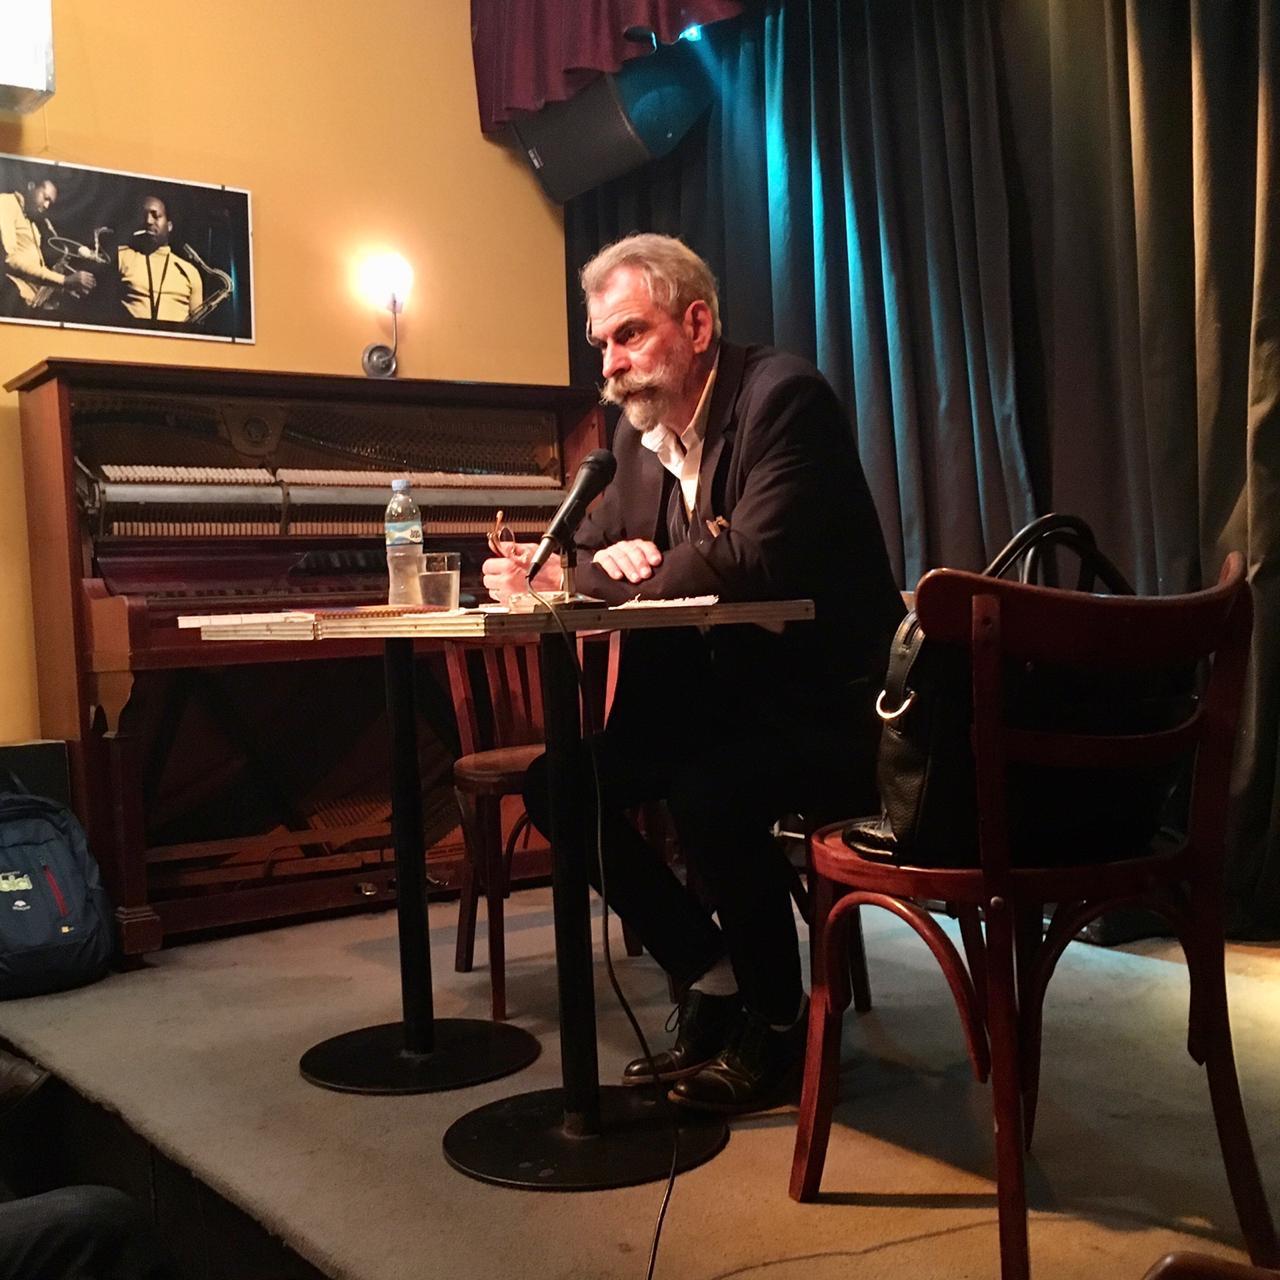 Entrevista realizada a Hugo Piciana